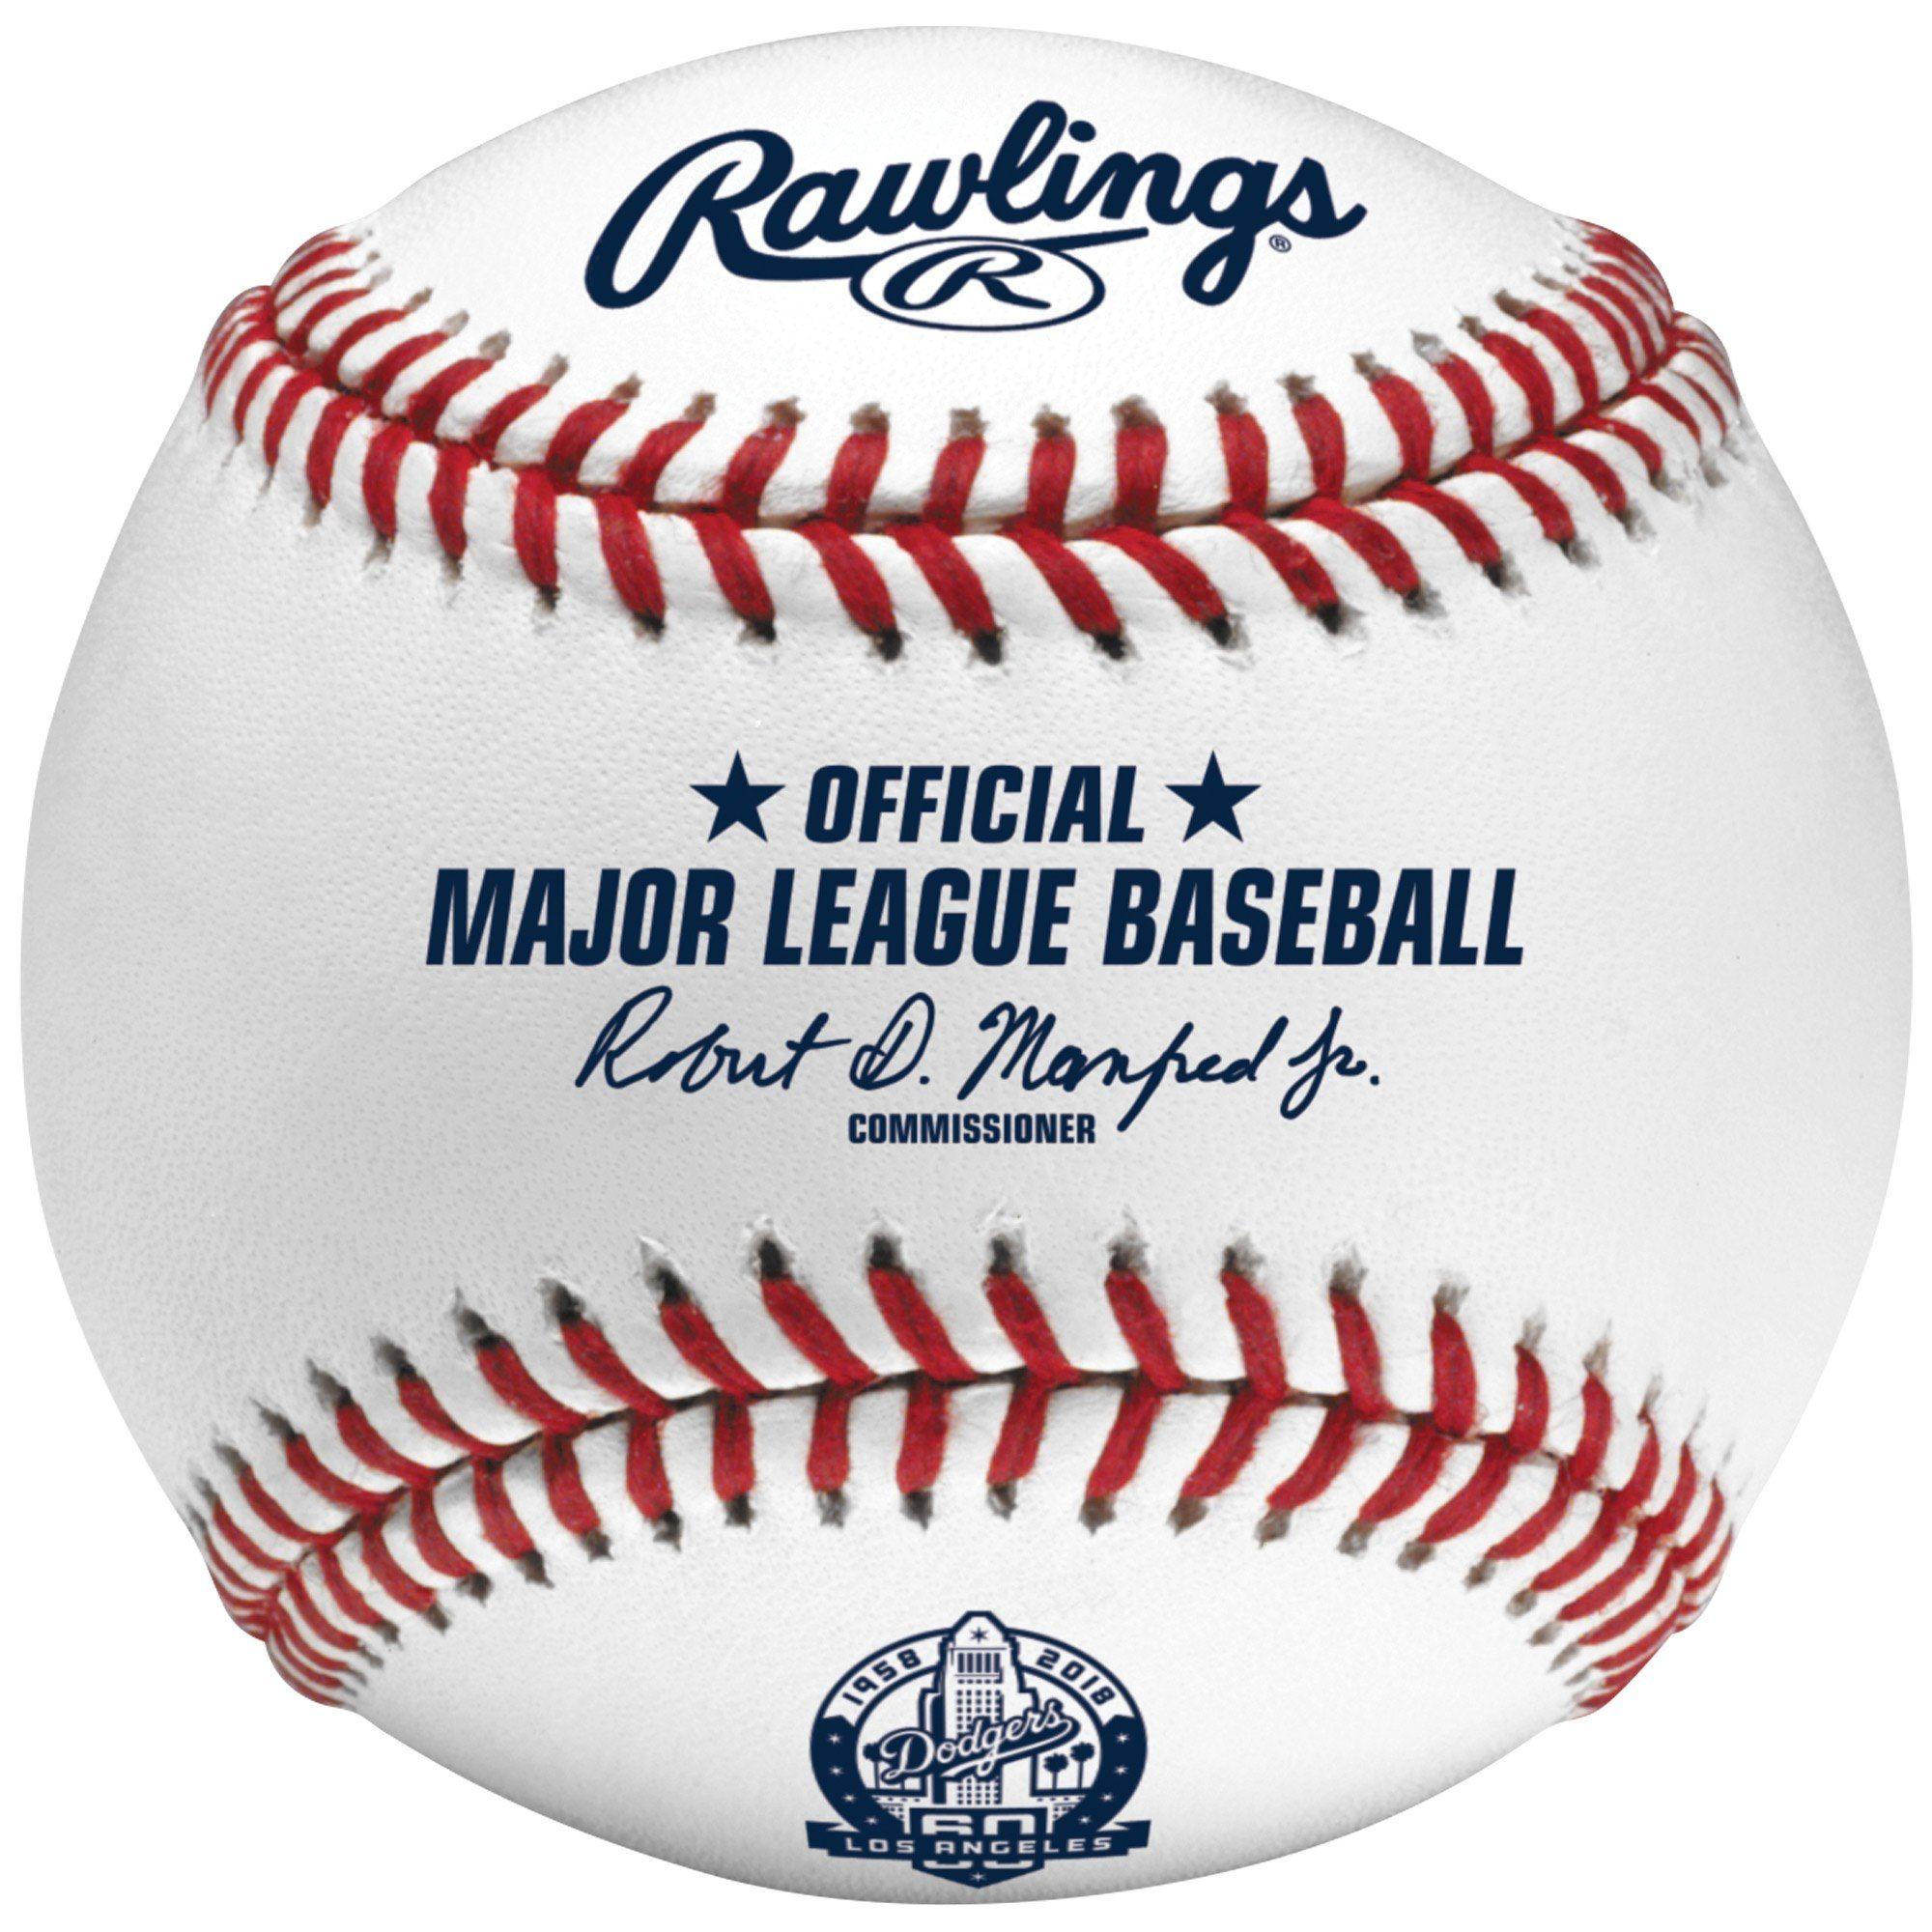 Los Angeles Dodgers Rawlings 60th Anniversary Baseball Rawlings Baseball Mlb World Series Major League Baseball